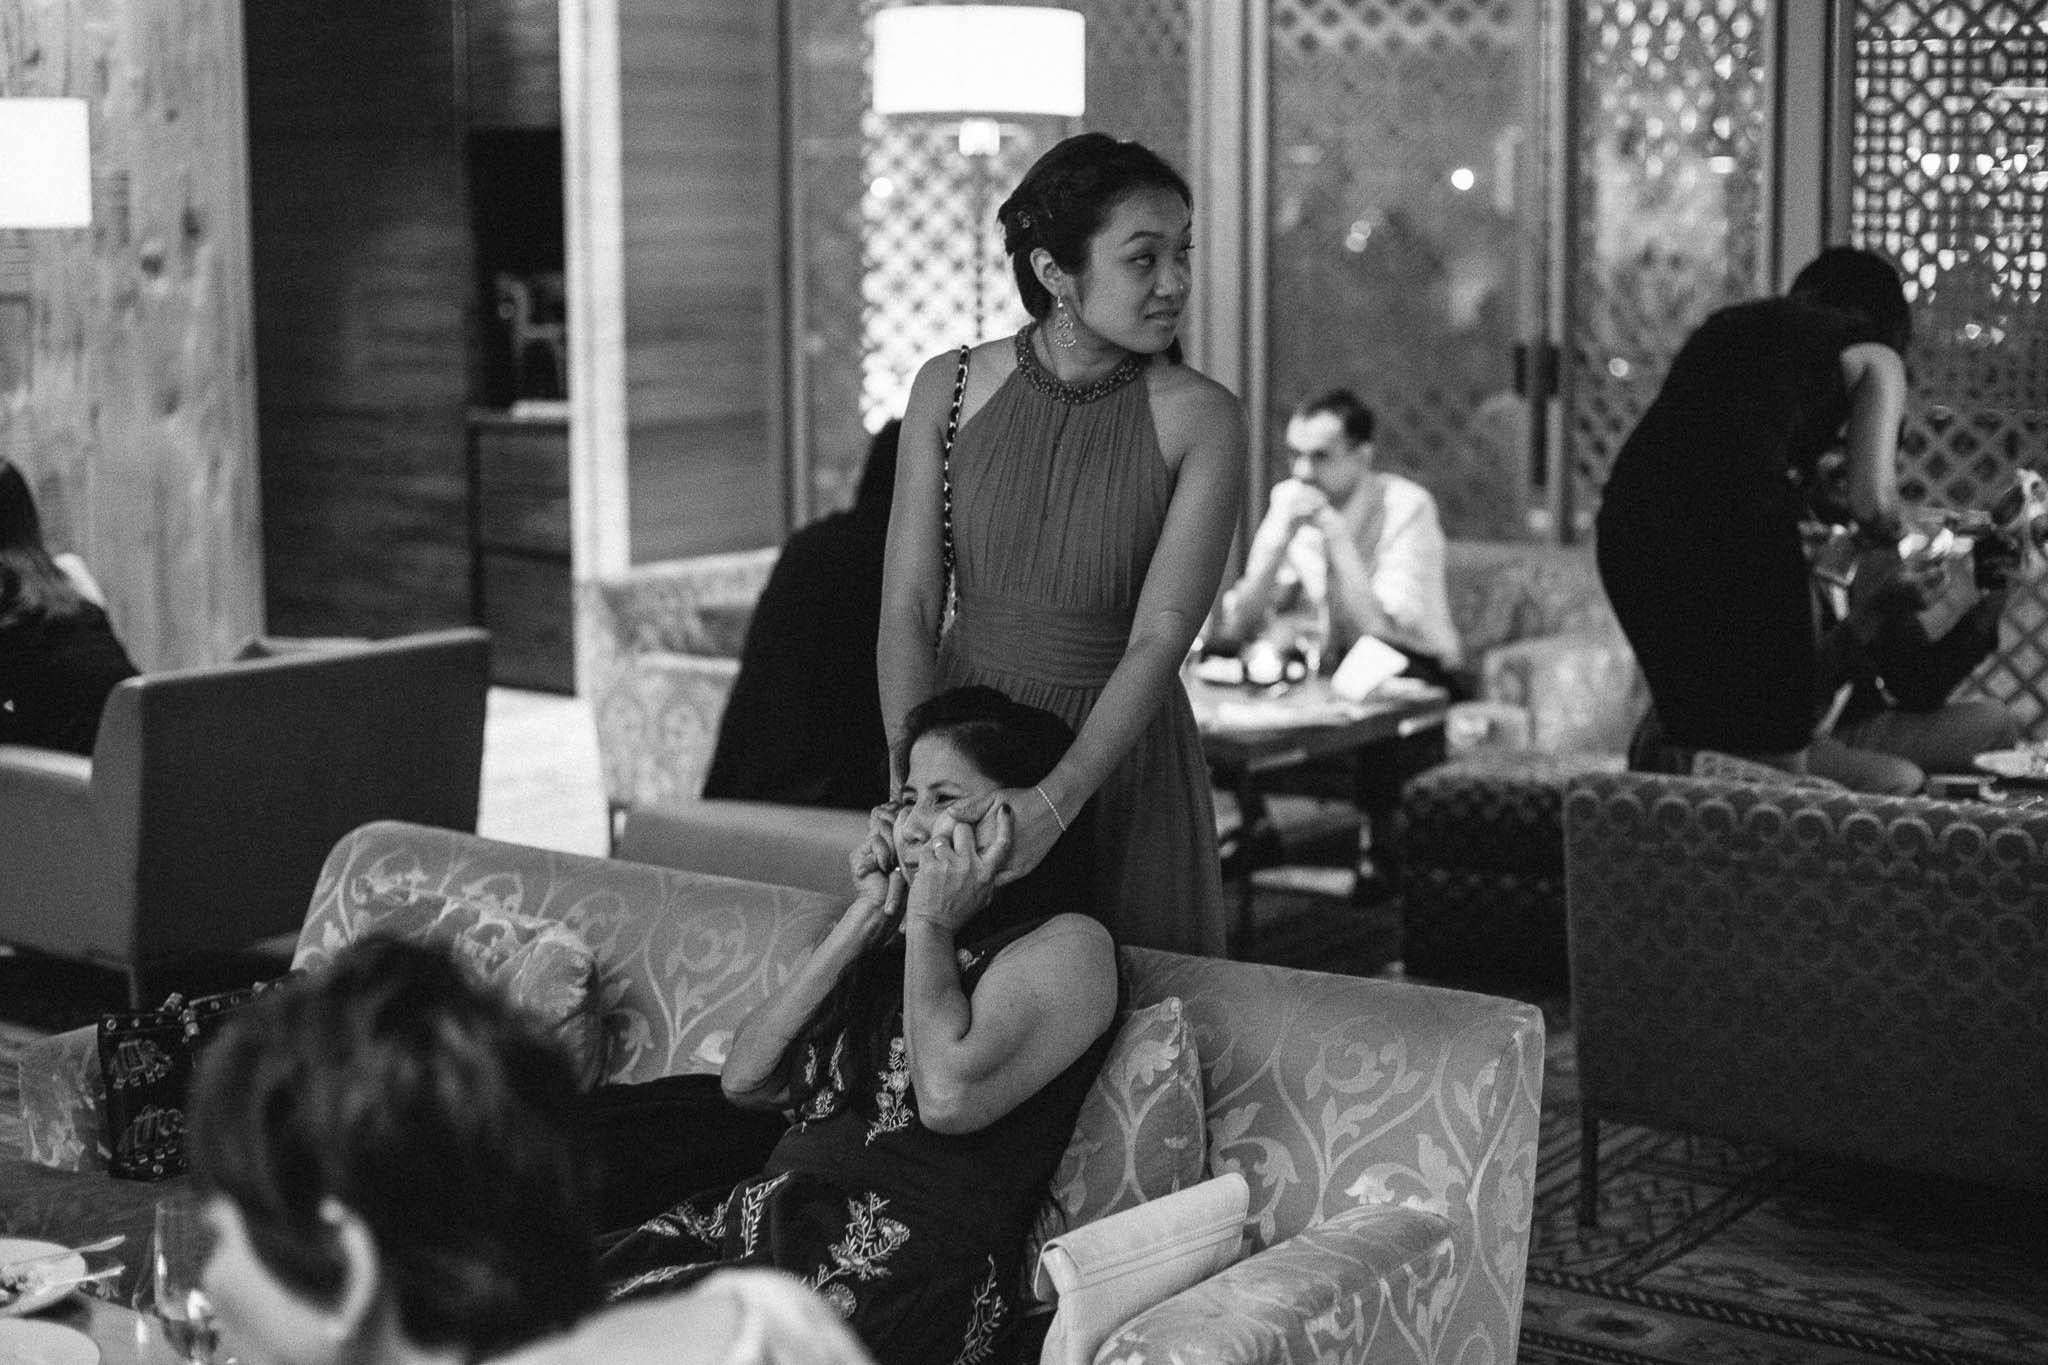 singapore-wedding-photographer-malay-indian-pre-wedding-travel-wmt-2015-jeremy-larissa-69.jpg